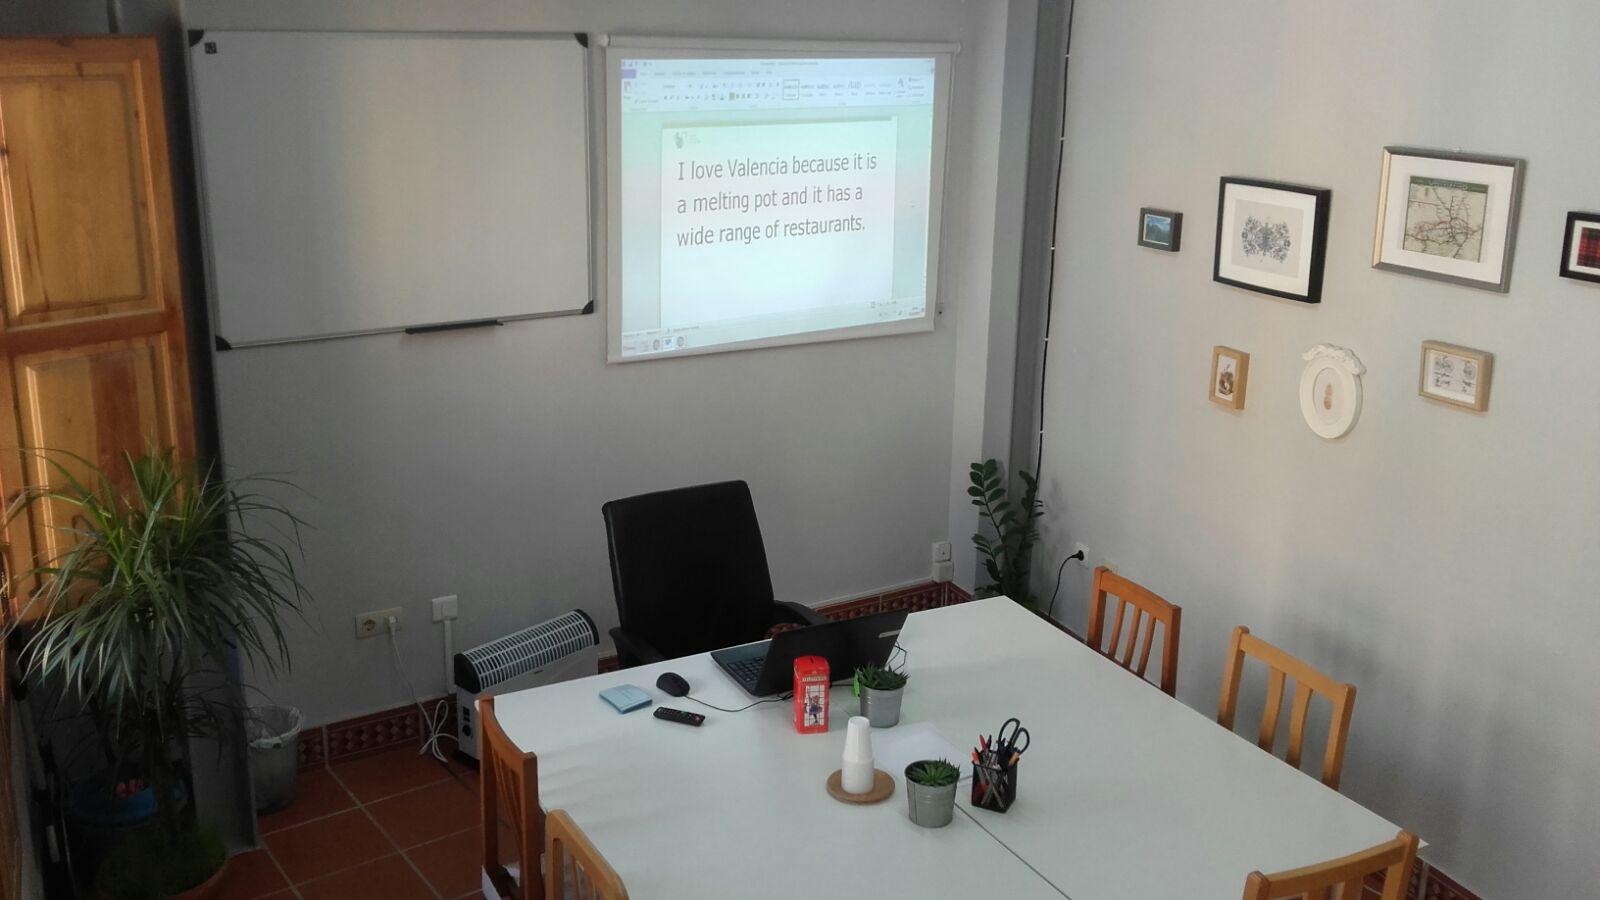 clases de inglés en Valencia - aula